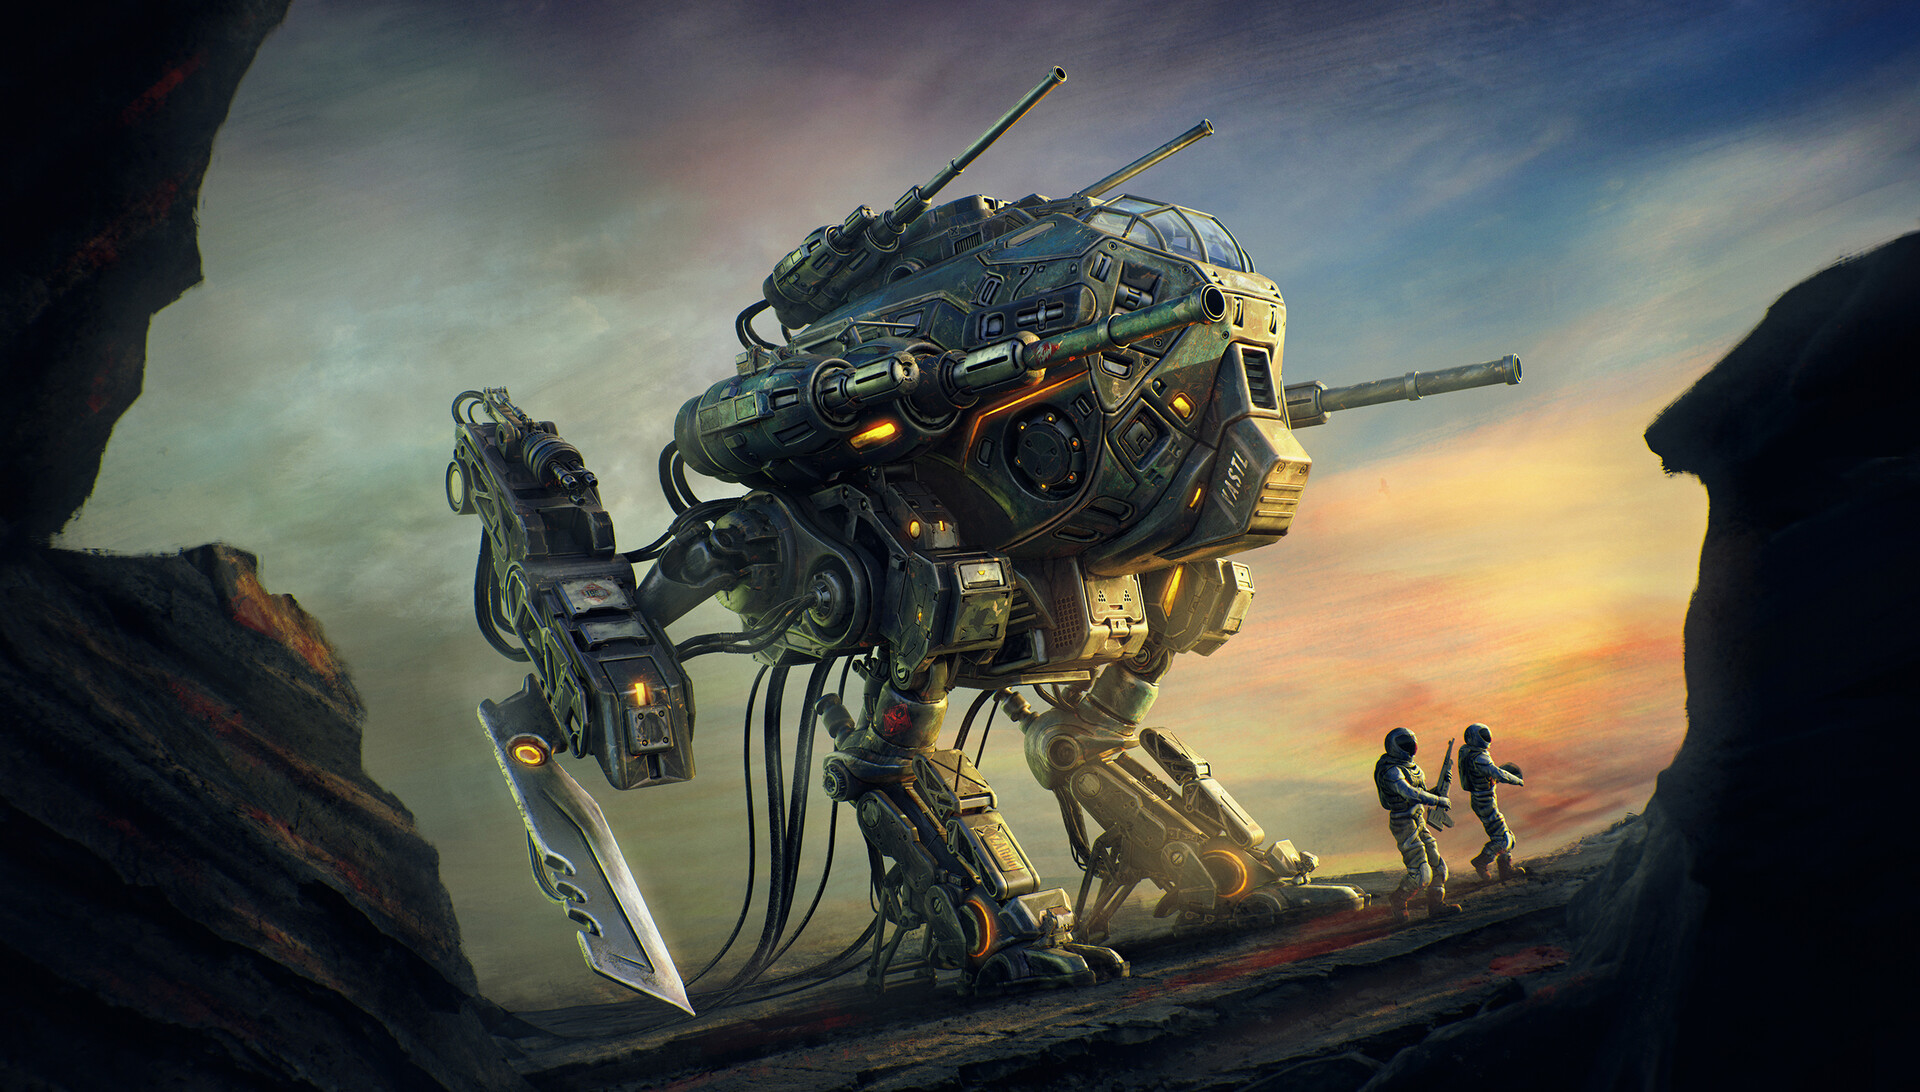 Sci-Fi Artworks by Mohamed Reda